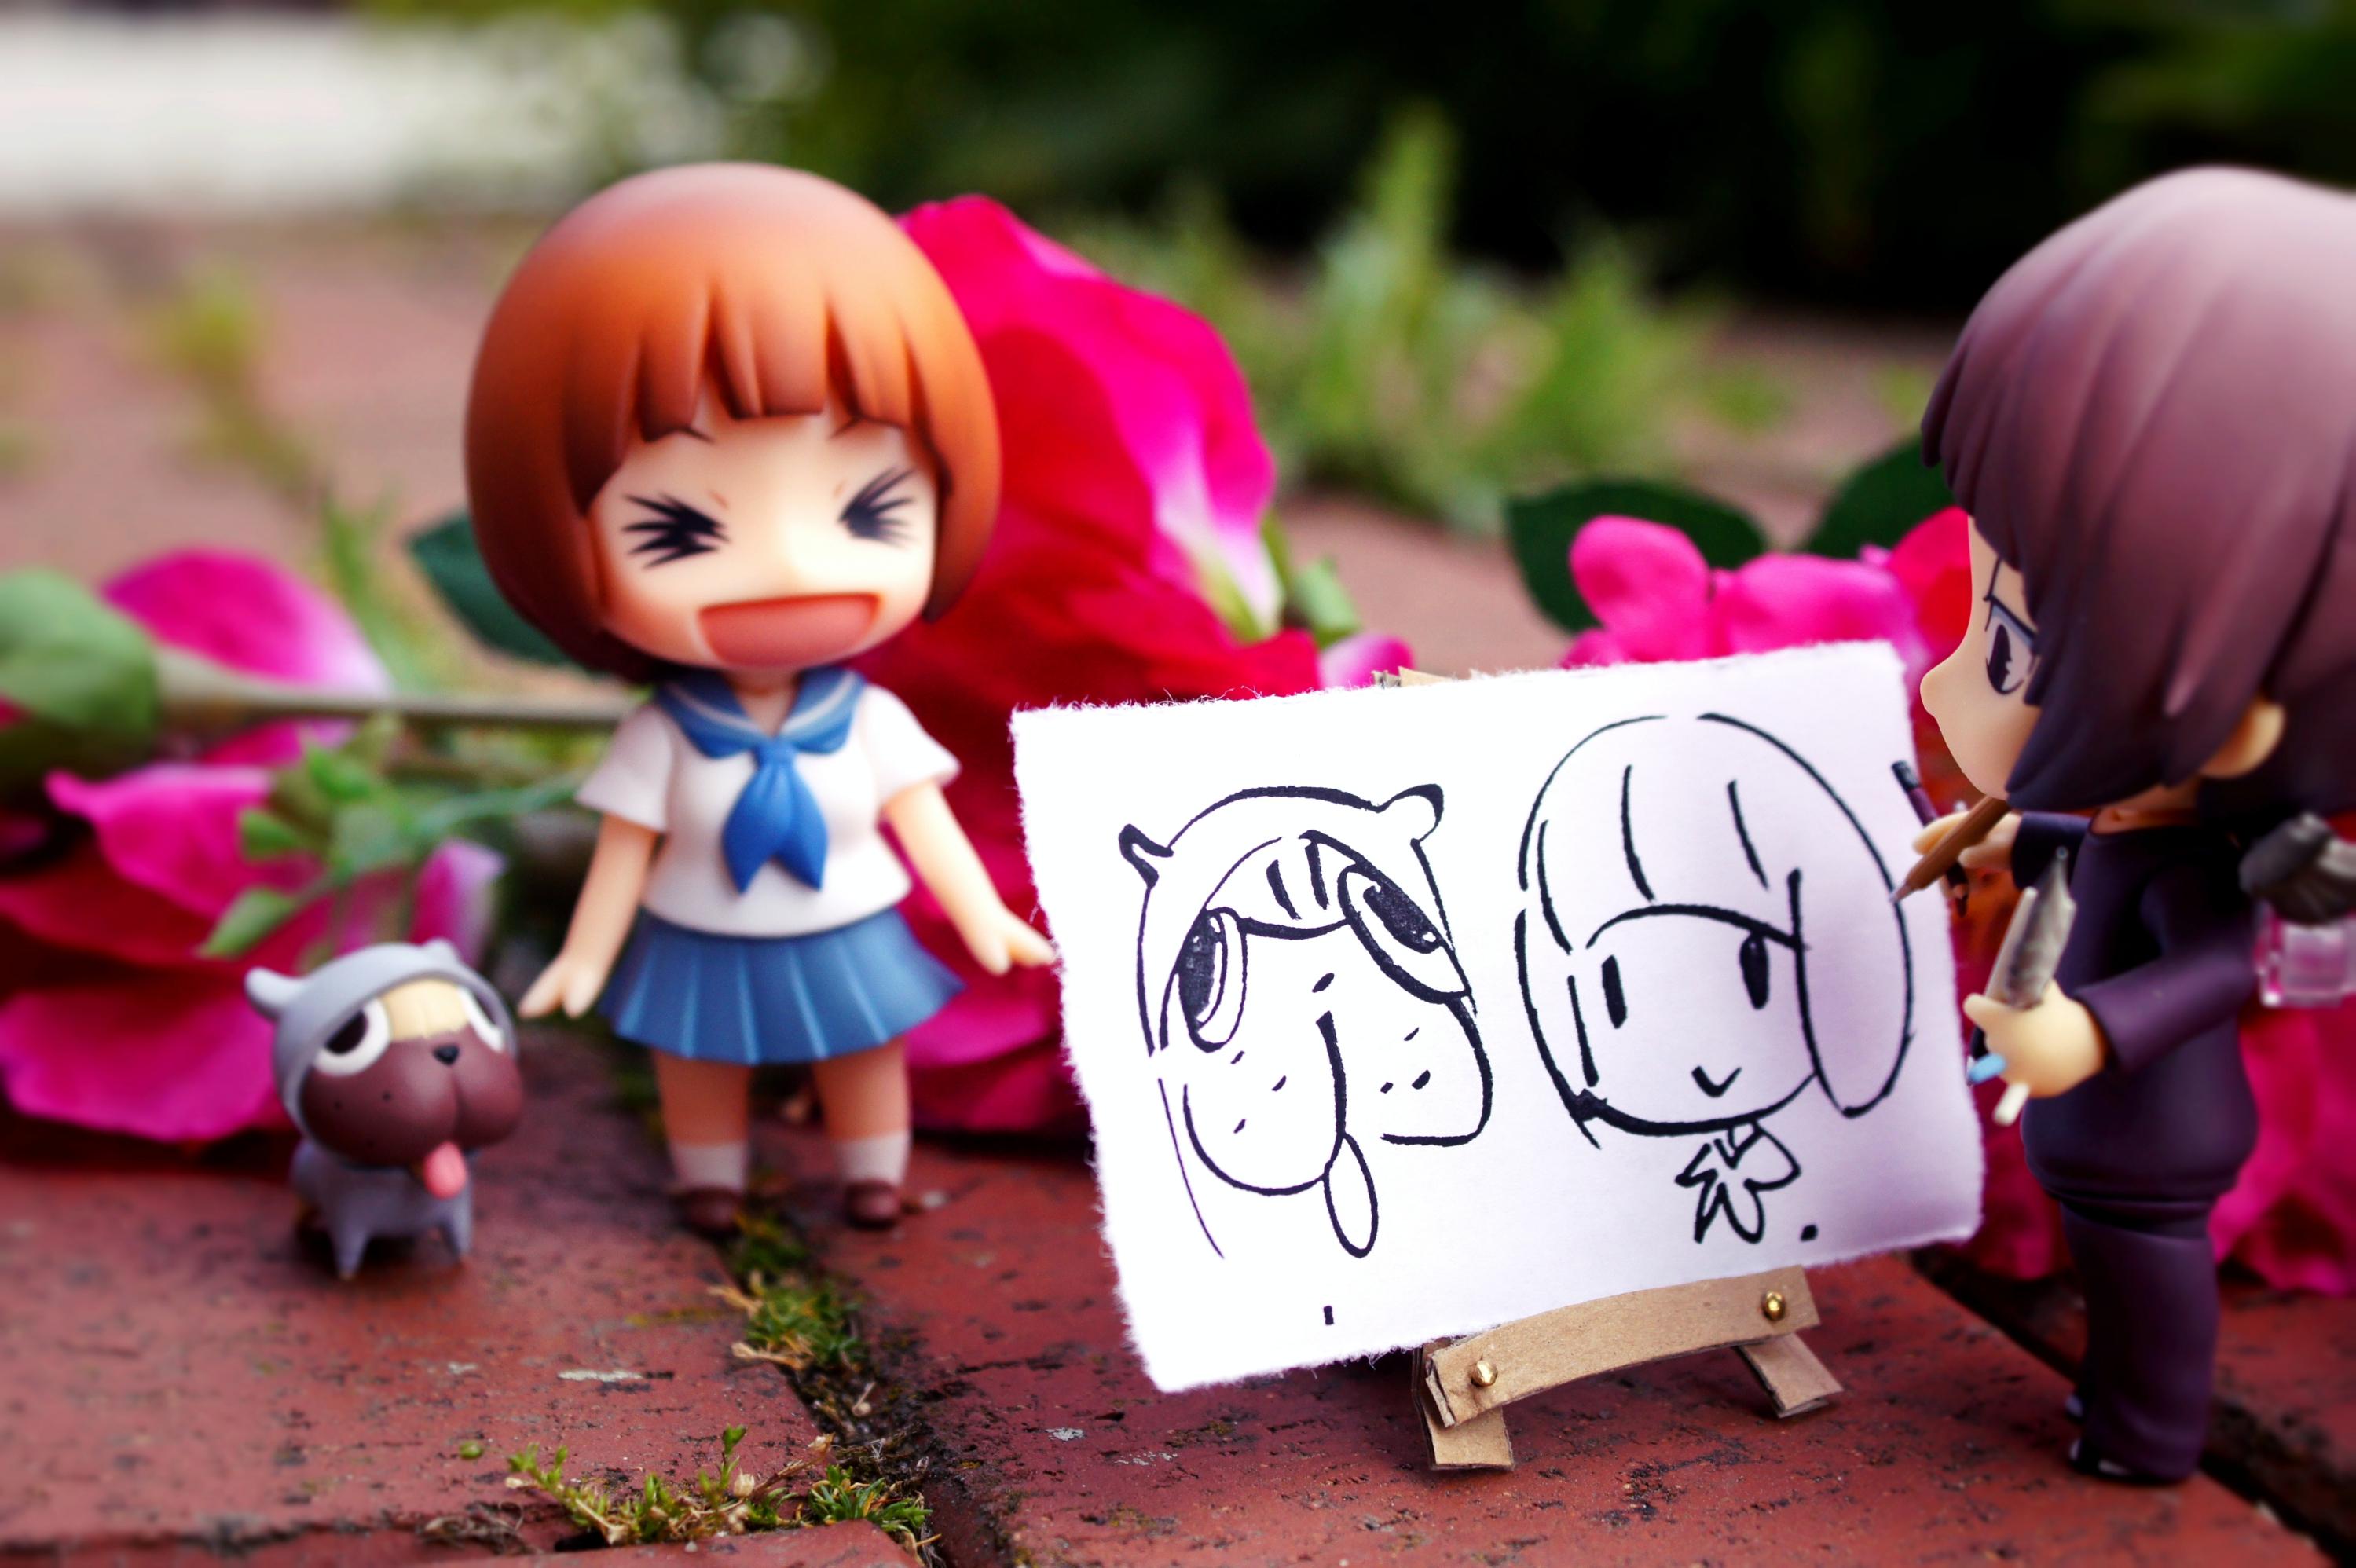 guts nendoroid good_smile_company trigger phat_company nendoron jun_(e.v.) m.i.c. niizuma_eiji bakuman. nakashima_kazuki kill_la_kill mankanshoku_mako